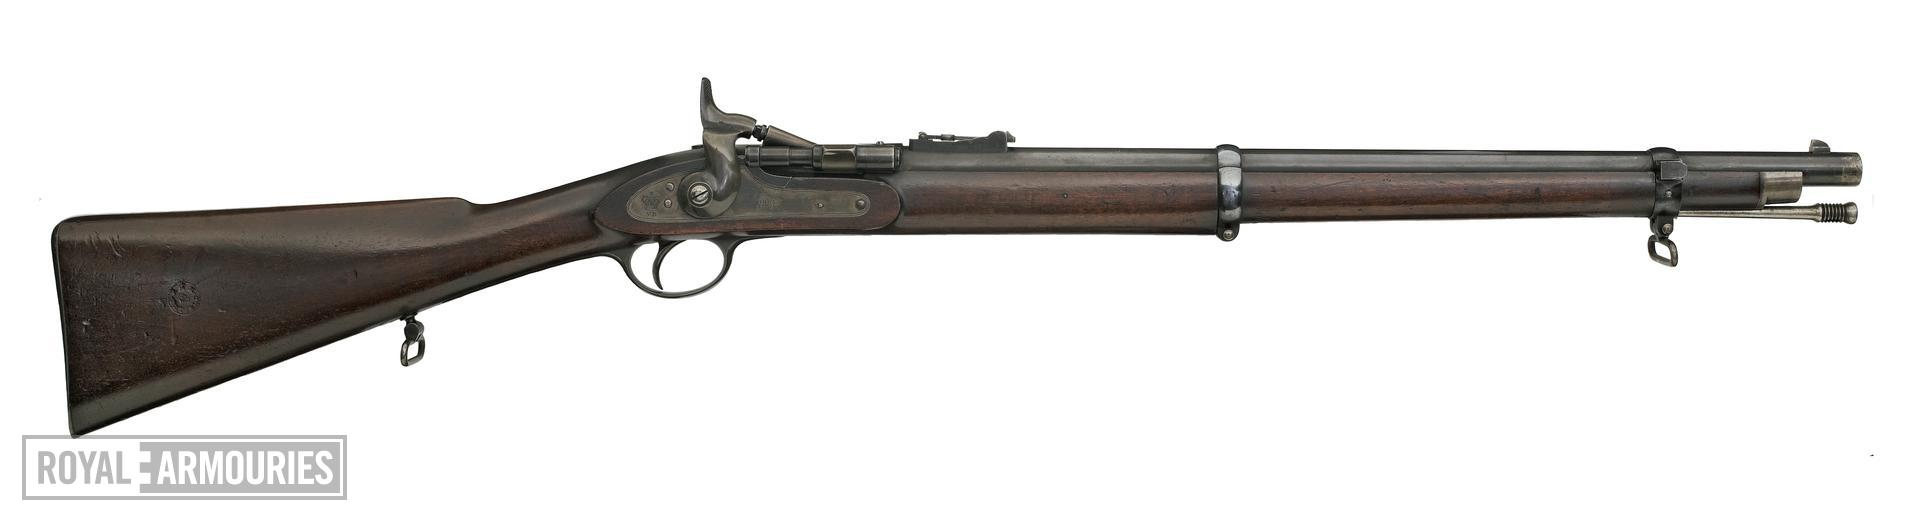 Centrefire breech-loading carbine - Snider for Irish Constabulary, sealed pattern